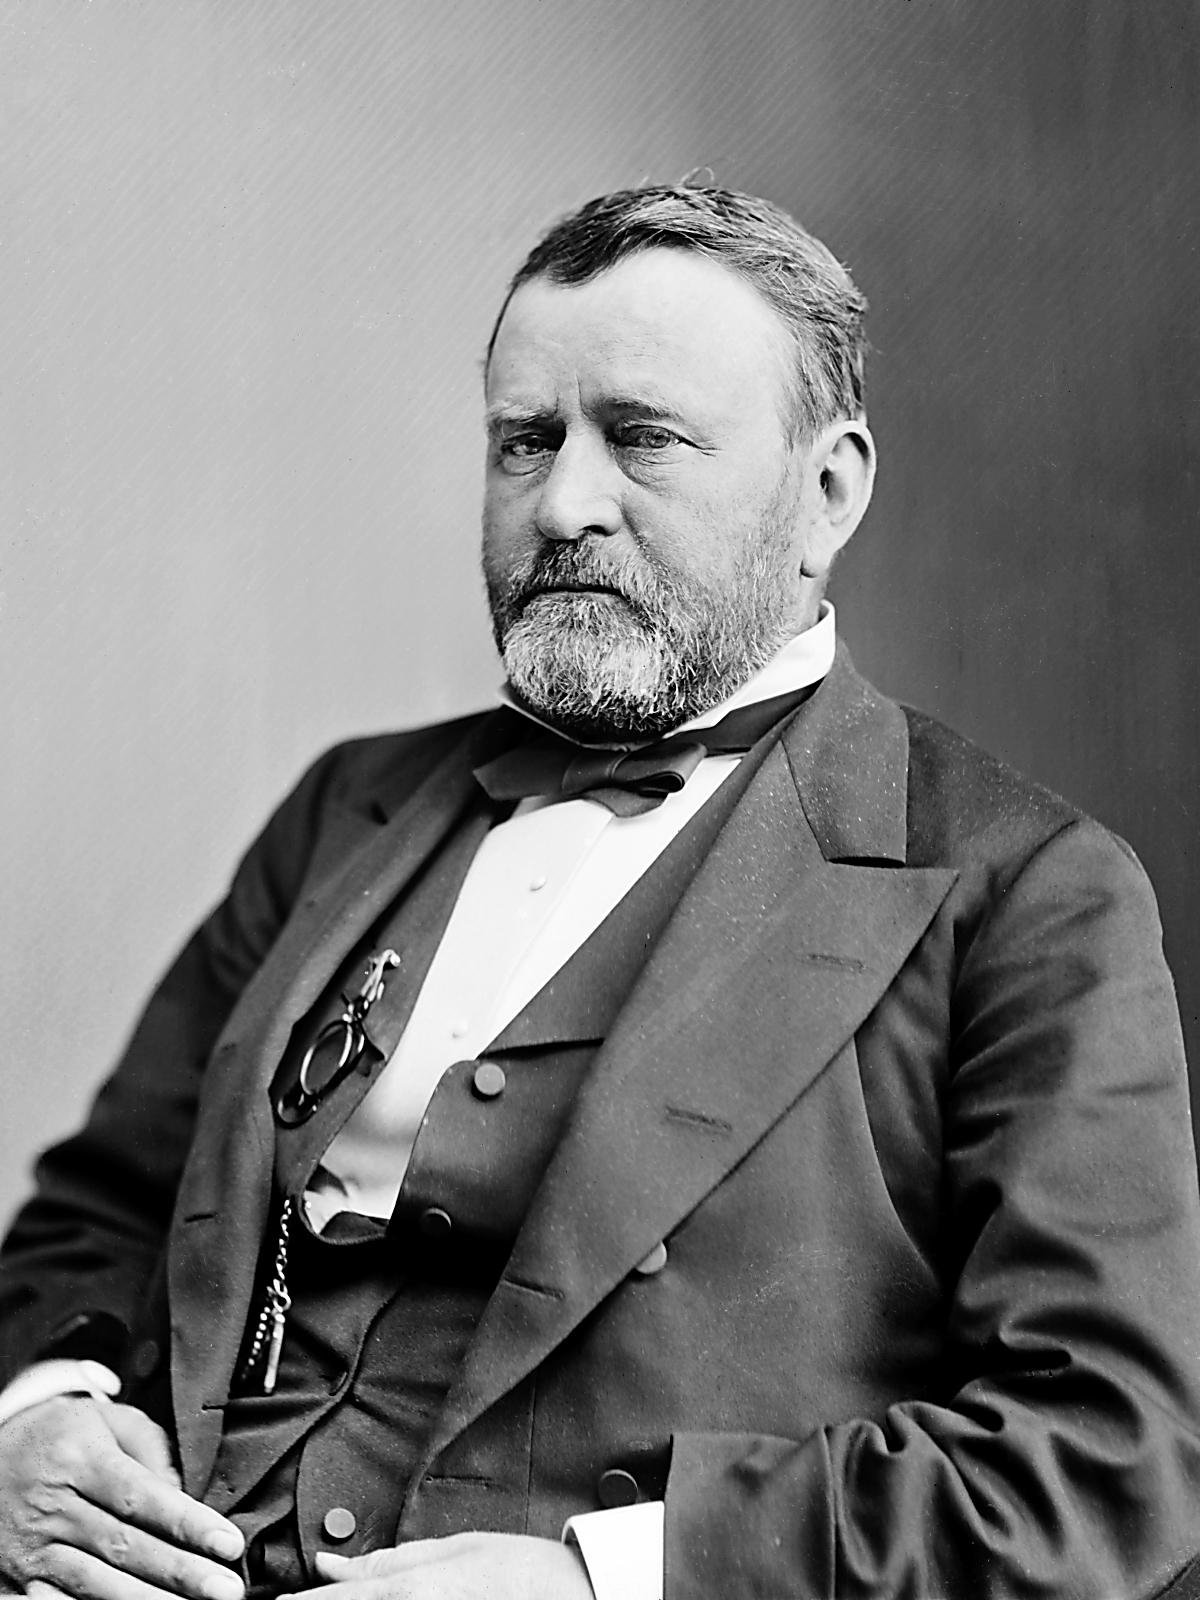 Ulysses S. Grant, Amerikanın 18. başkanı (DY-1822) tarihte bugün